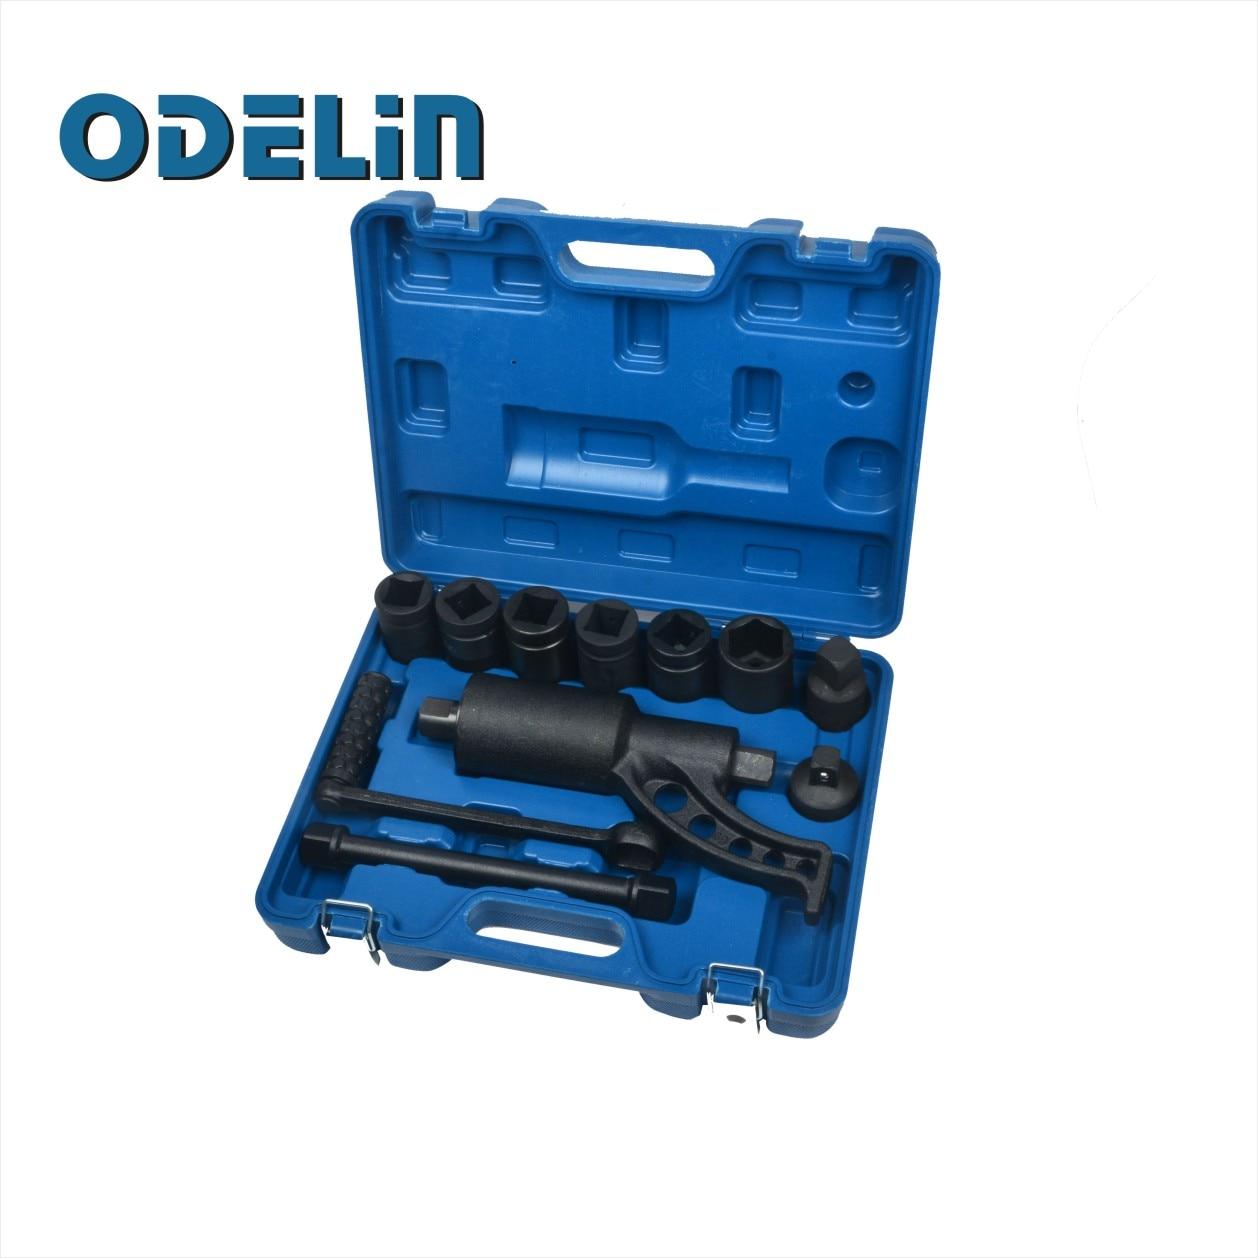 Truck Wheel Lug Nut Wrench Impact Sockets Hand Torque Multiplier Tire Tools Kit